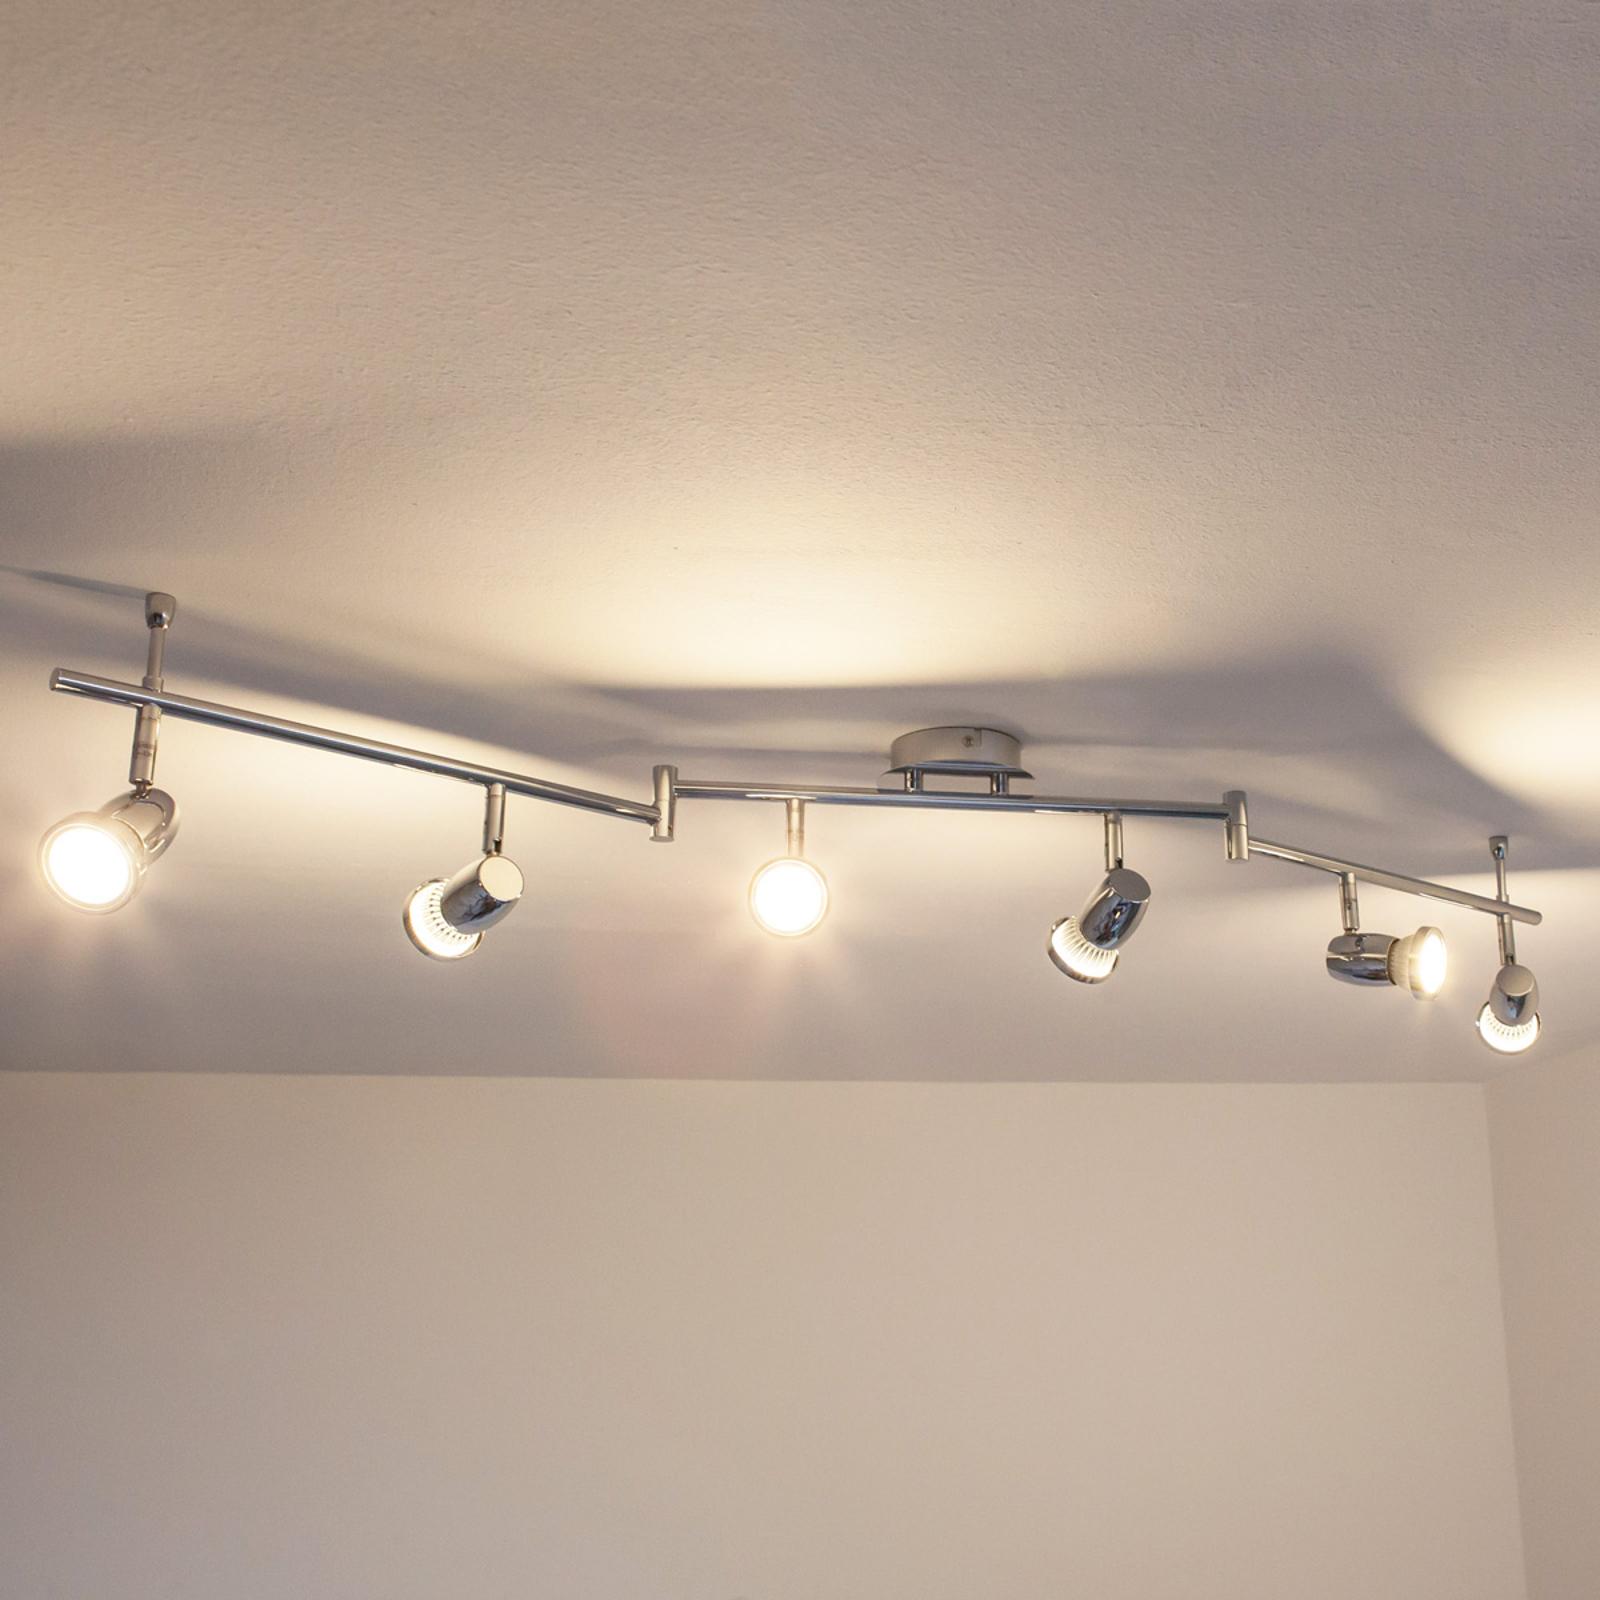 LED krom loftlampe med 6 lyskilder, Arminius